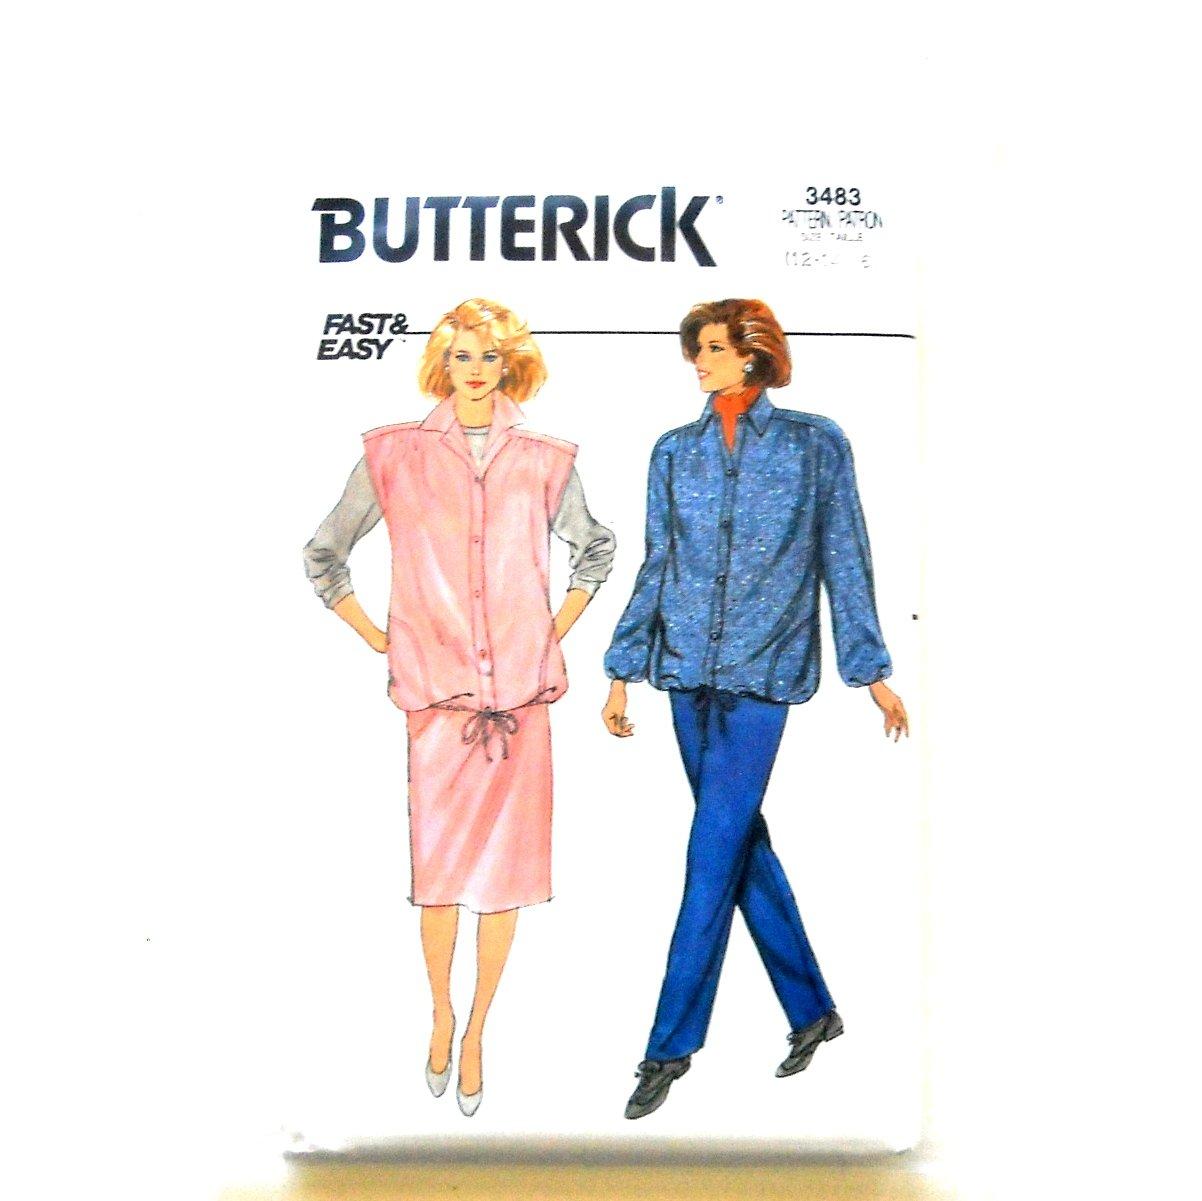 Misses Maternity Jacket Vest Skirt Pants Size 12 - 16 Vintage Butterick Sewing Pattern 3483